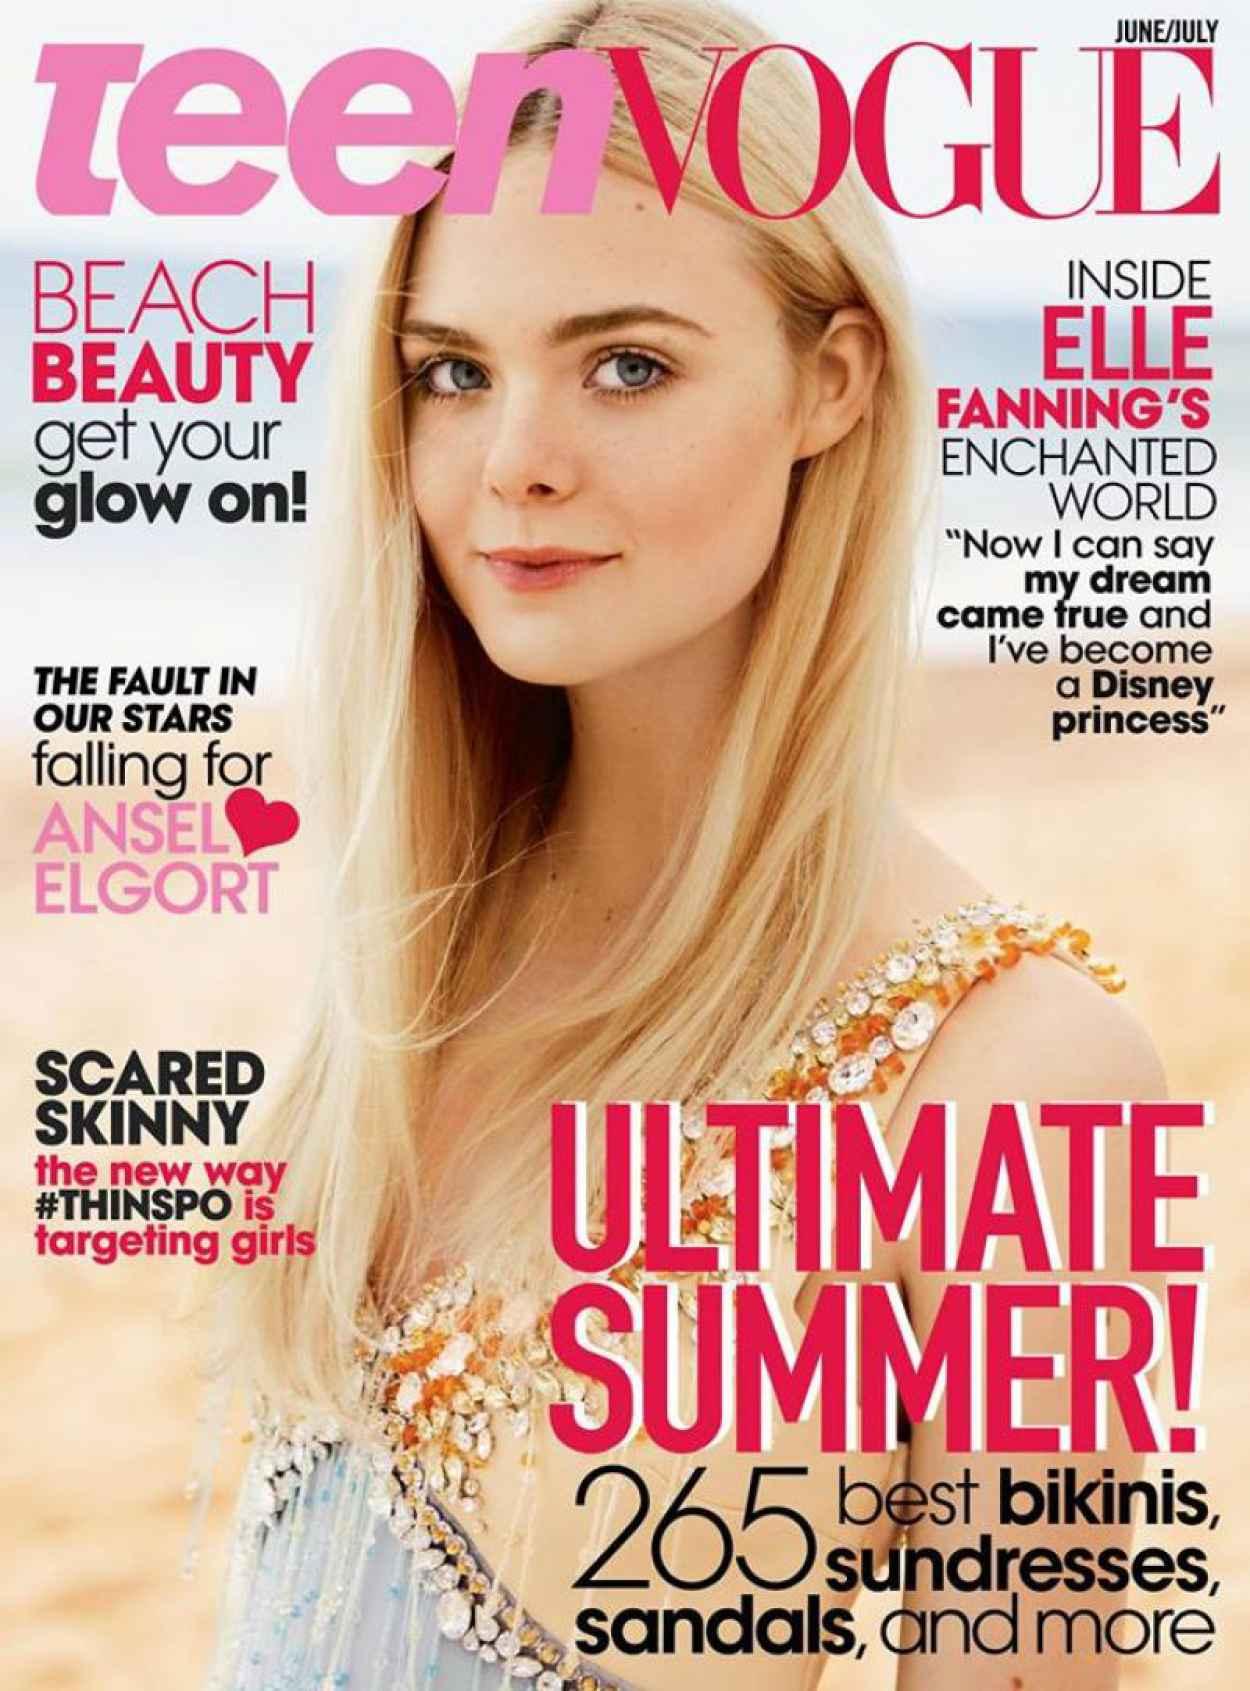 Elle Fanning - Teen Vogue Magazine June July 2015 Cover-1